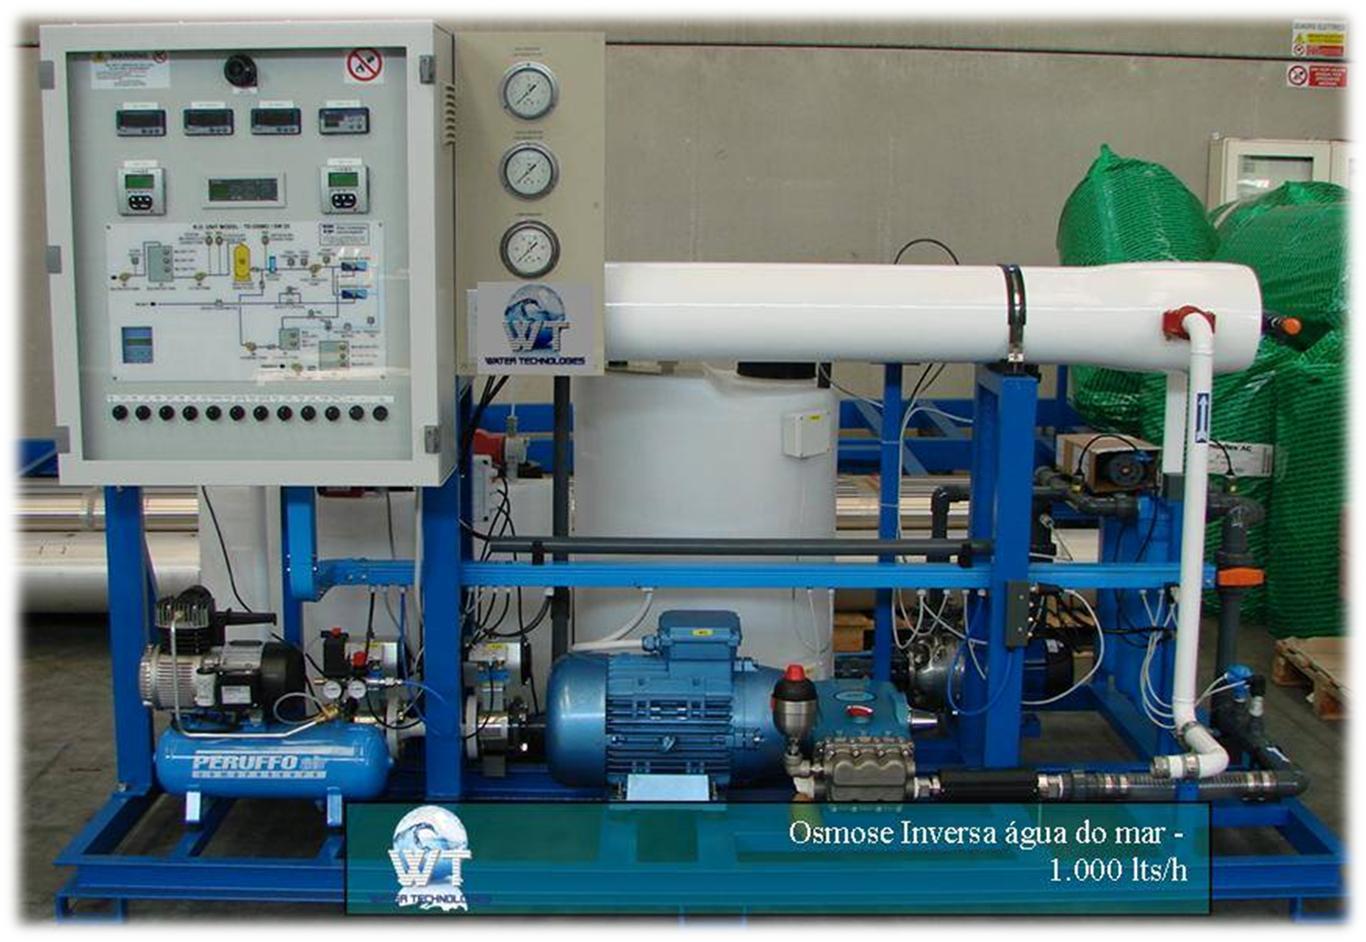 osmose inversa agua do mar 1000 lts h